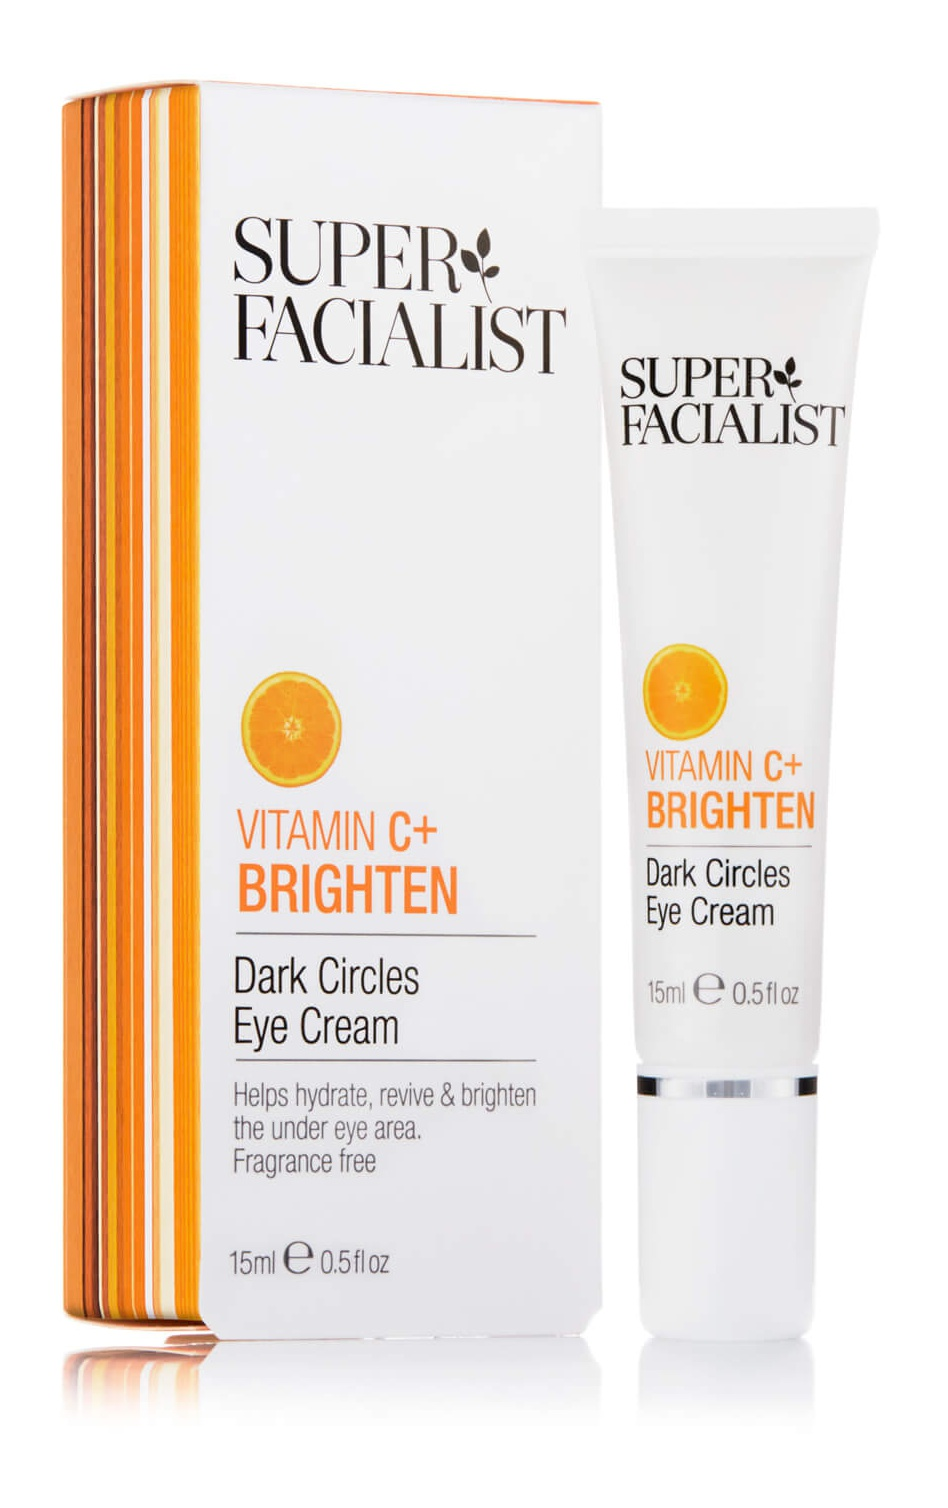 Super Facialist Vitamin C+ Dark Circles Eye Cream